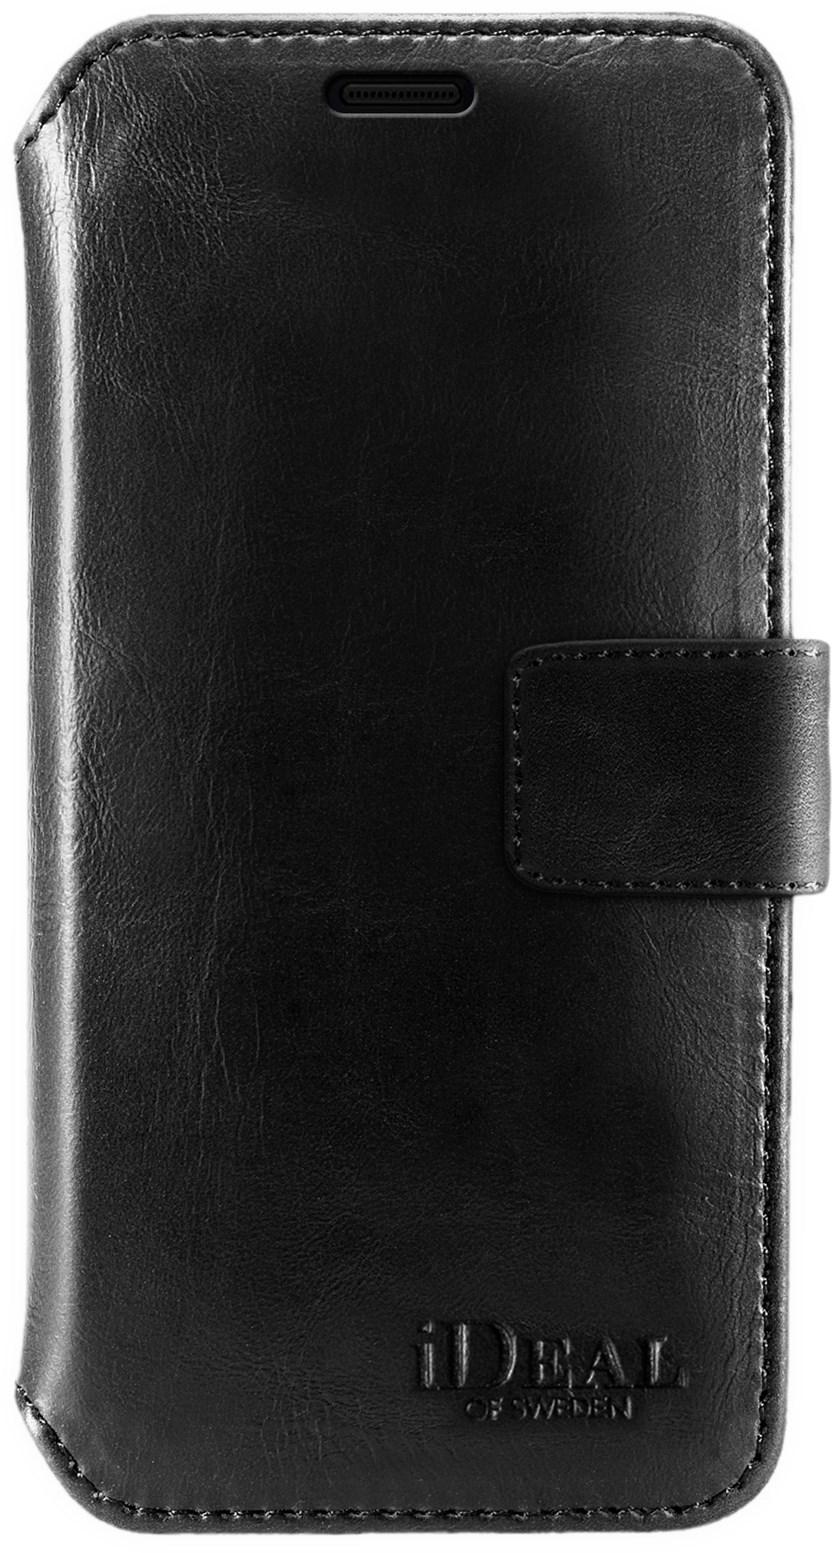 iDeal of Sweden Ideal Sthlm Wallet Samsung Galaxy S10e Black